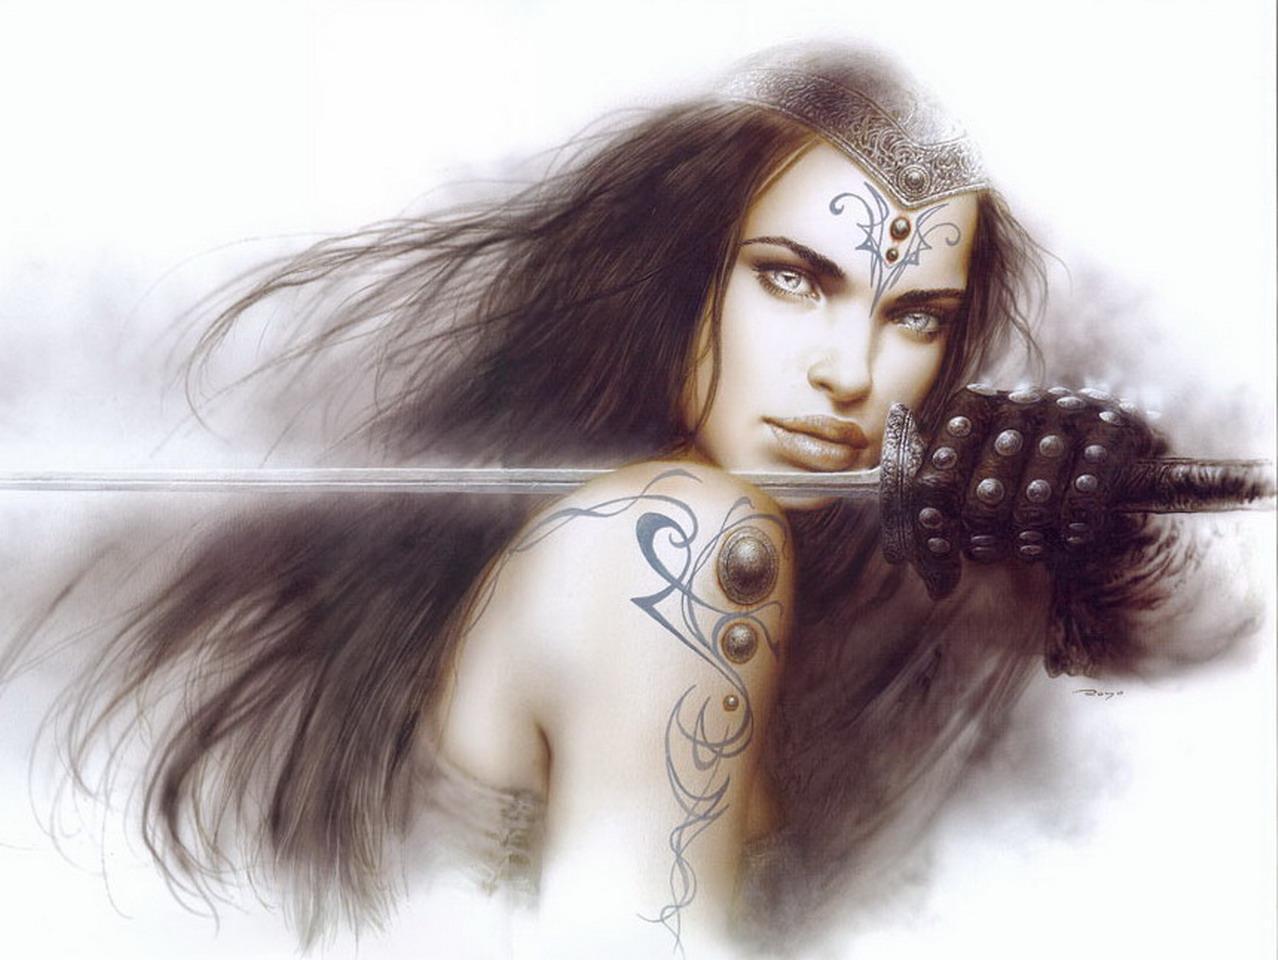 Royo Wallpaper Fantasy Art 13944083 1278 960